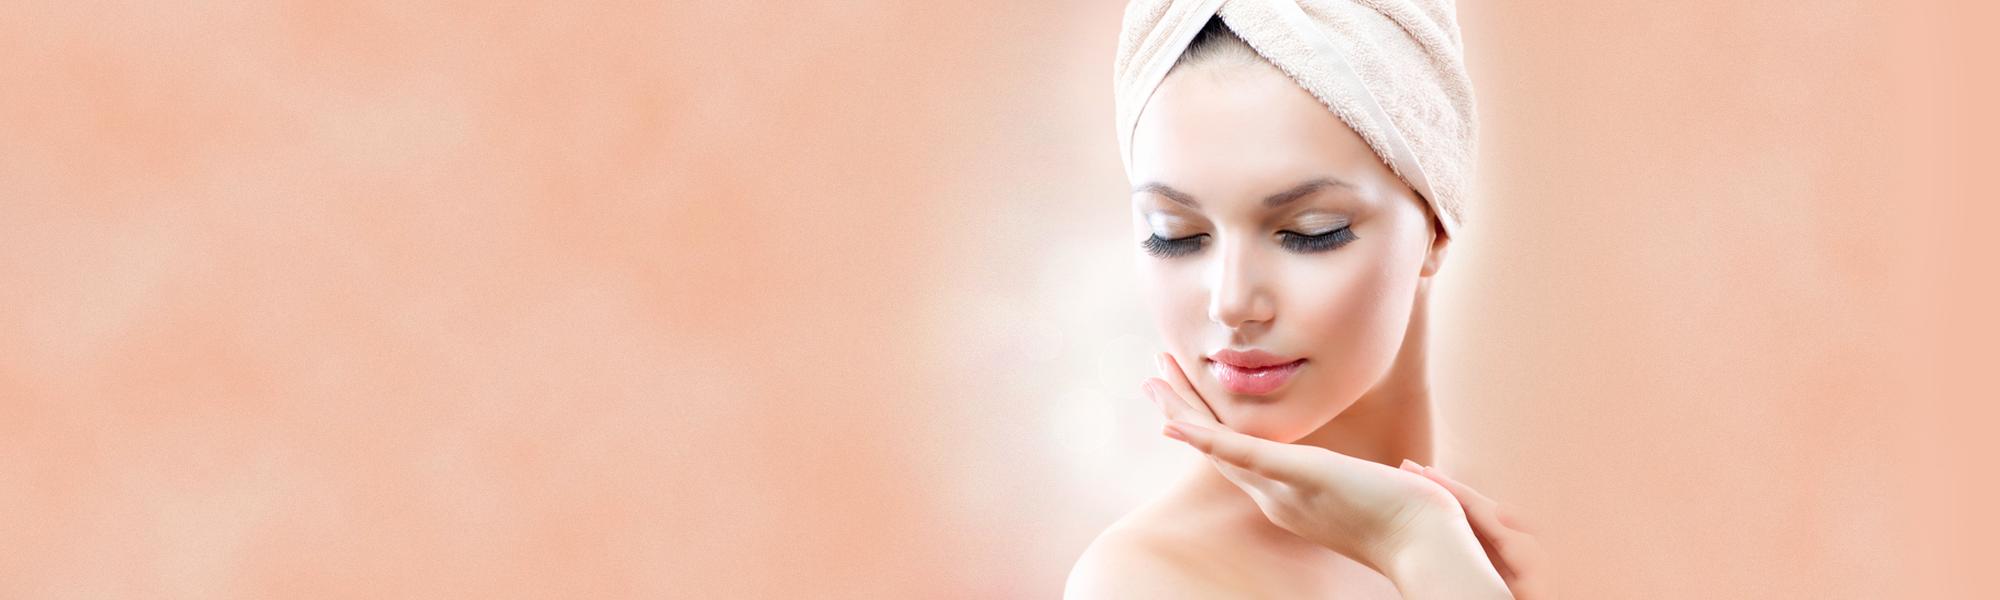 bloom-beaty-studio-facial-skincare-banner5